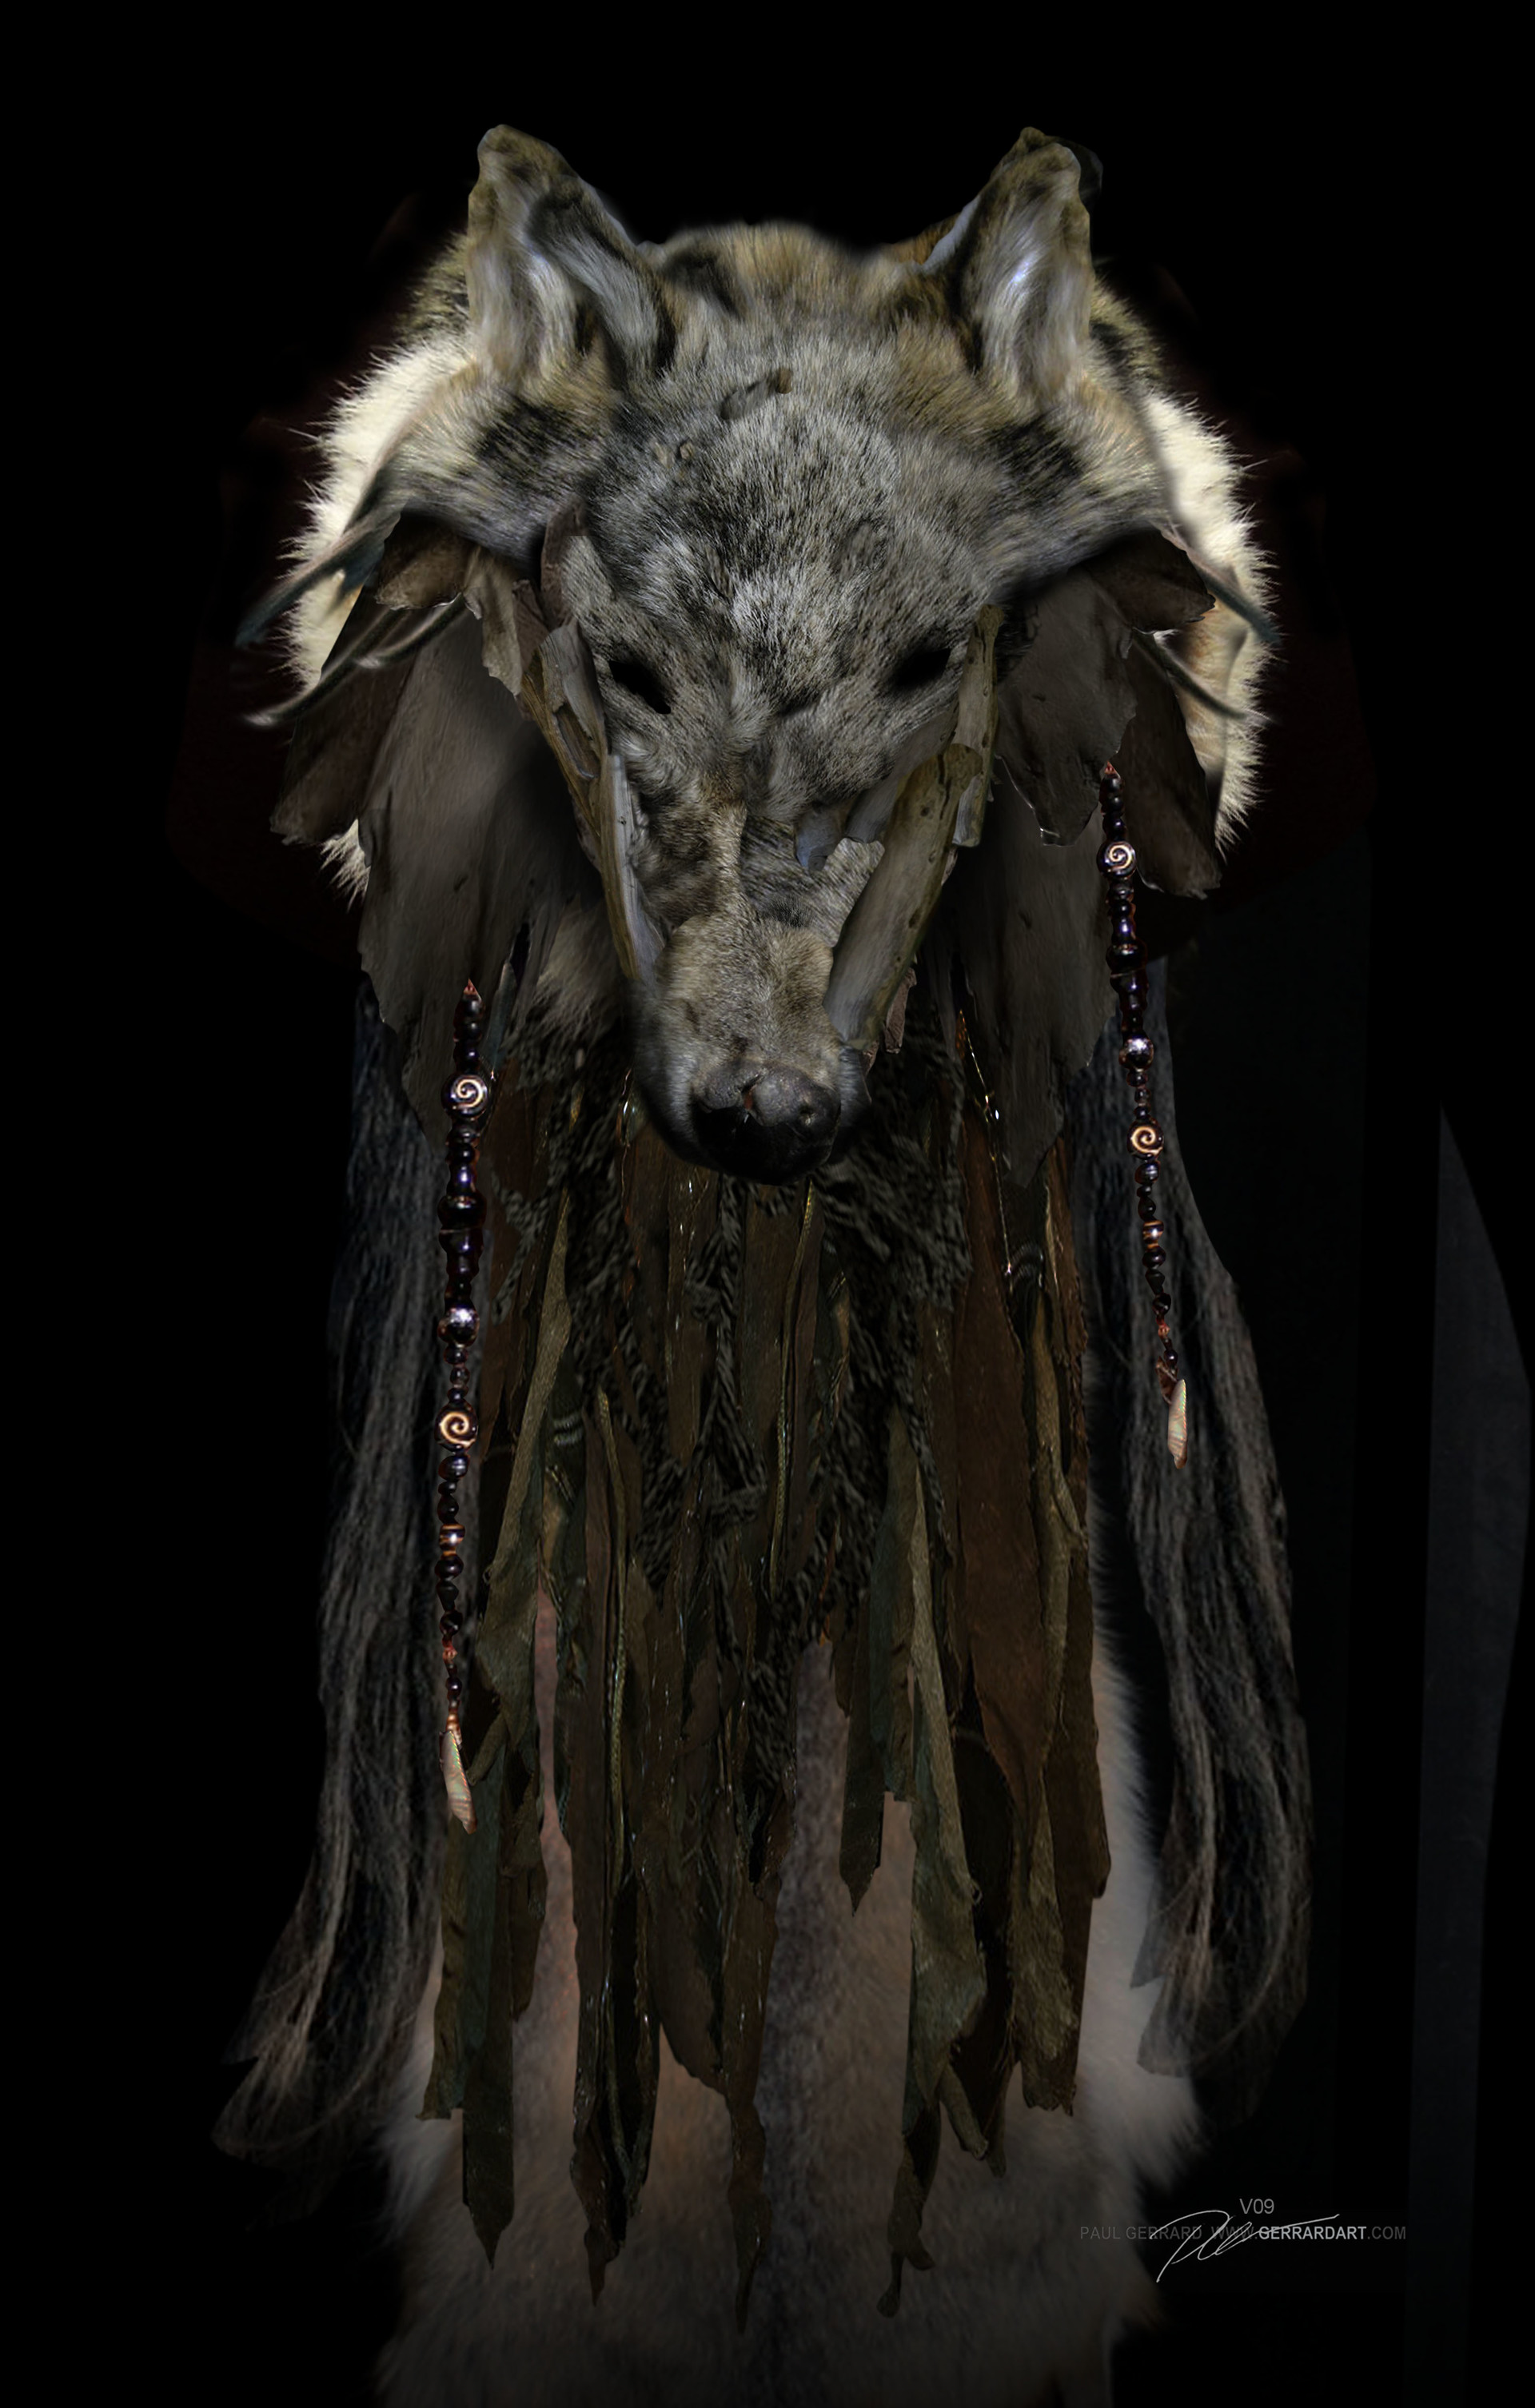 Paul gerrard wolf 09